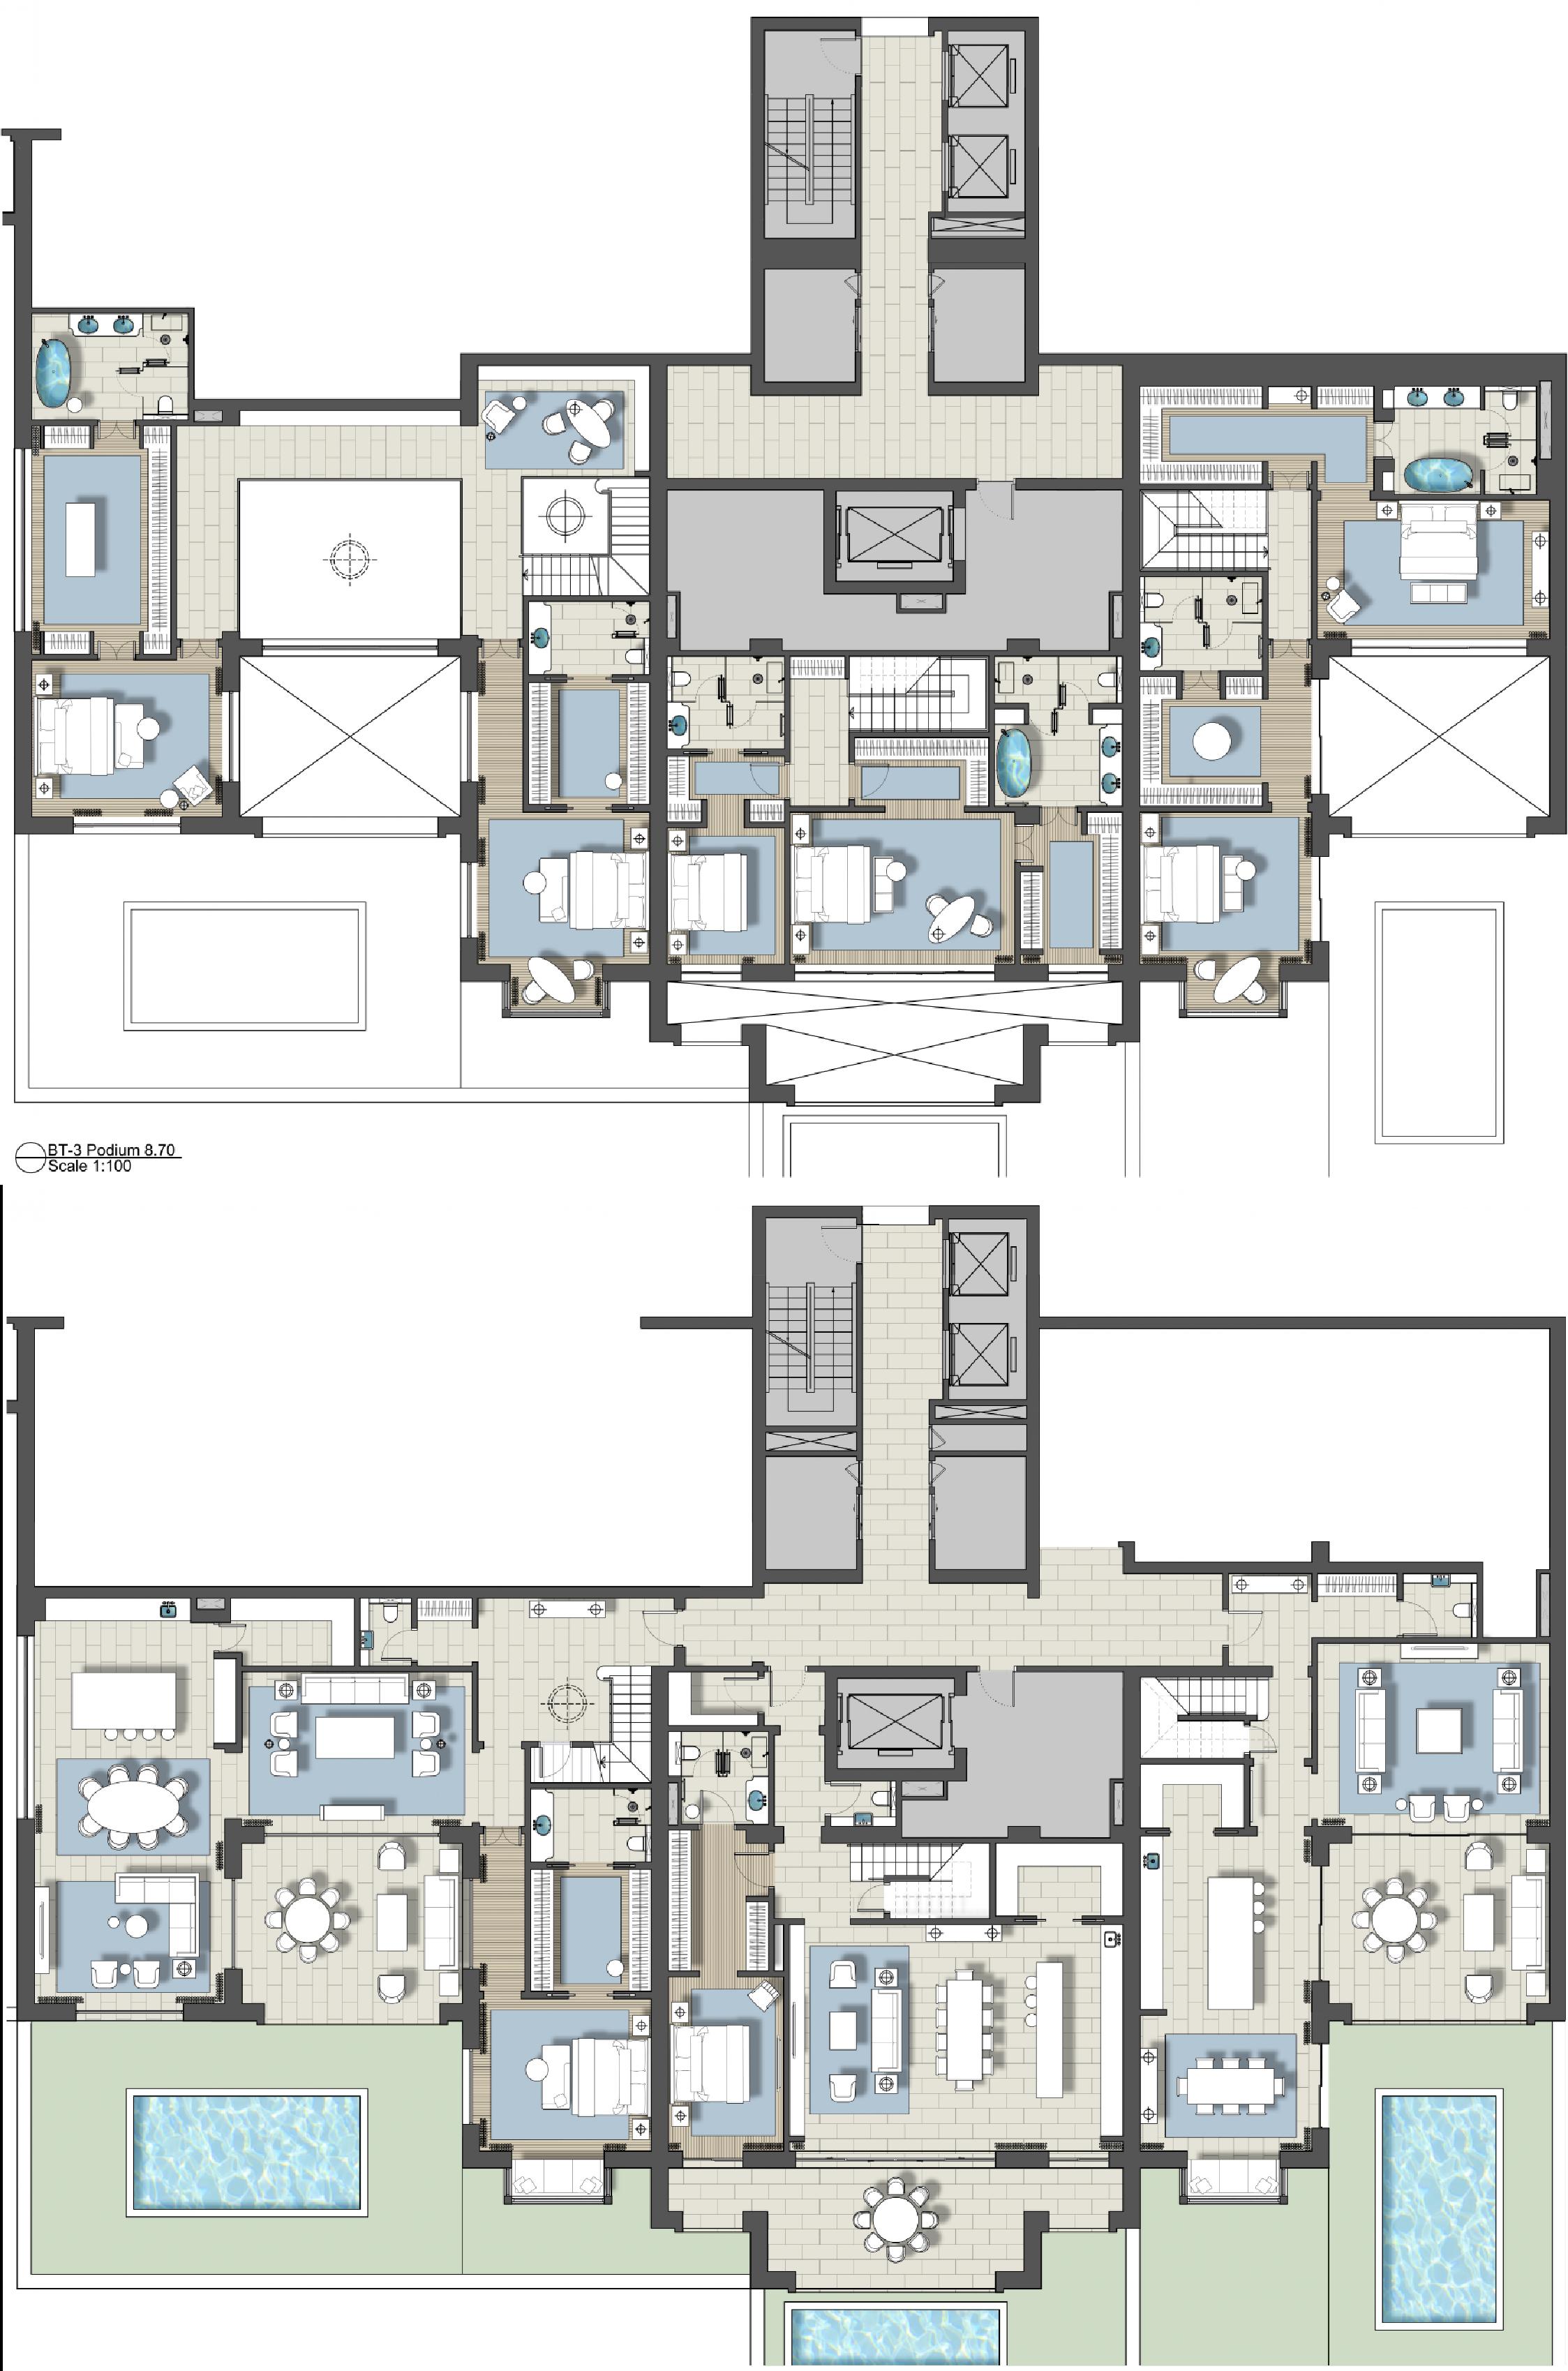 Architectural Designer At Ga Design International Hotel Floor Plan House Layout Plans Architectural Floor Plans